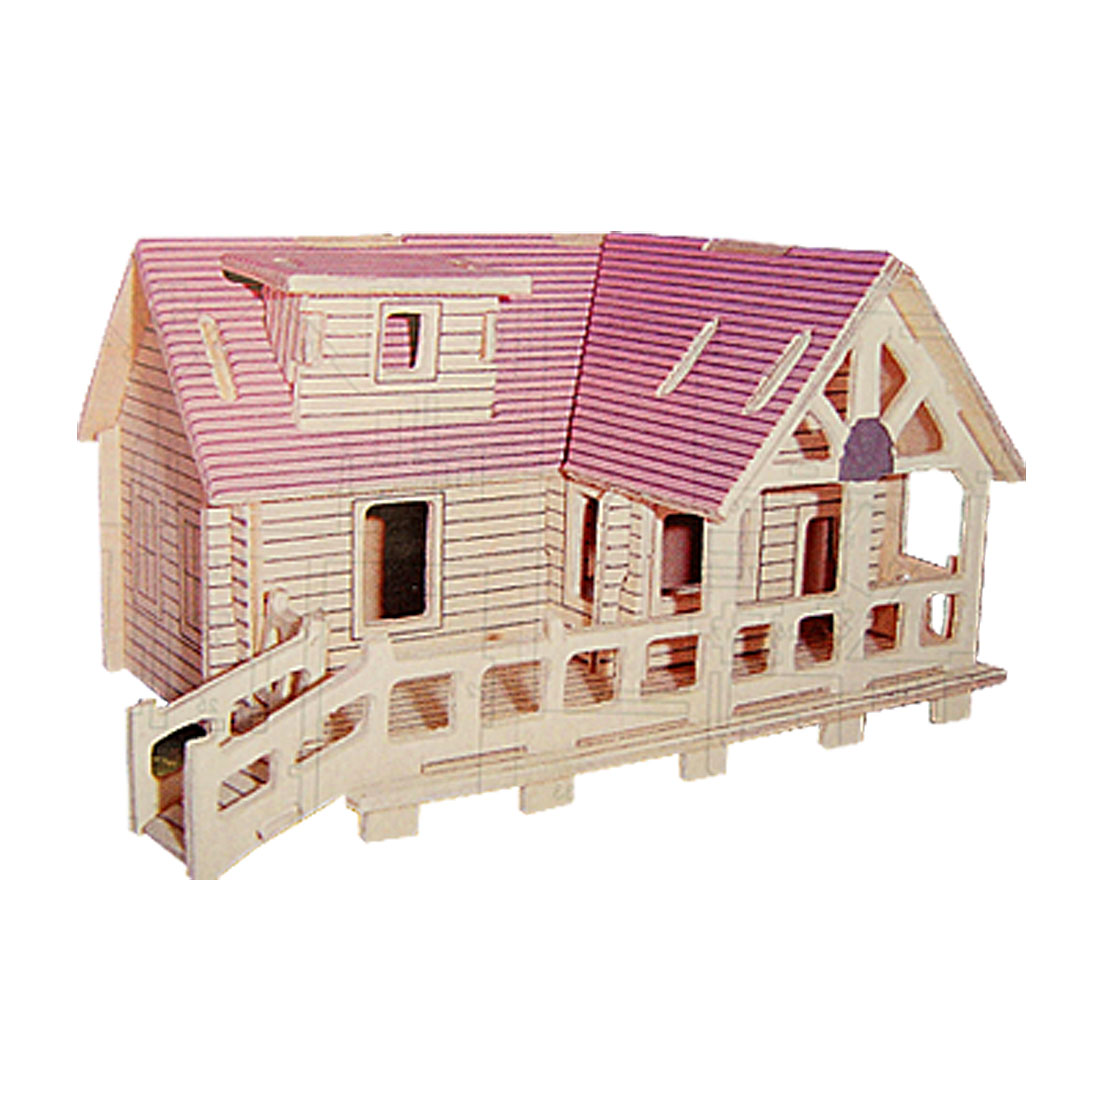 Stylish Educational 3D Jigsaw Villa Model Wooden Puzzle Toy